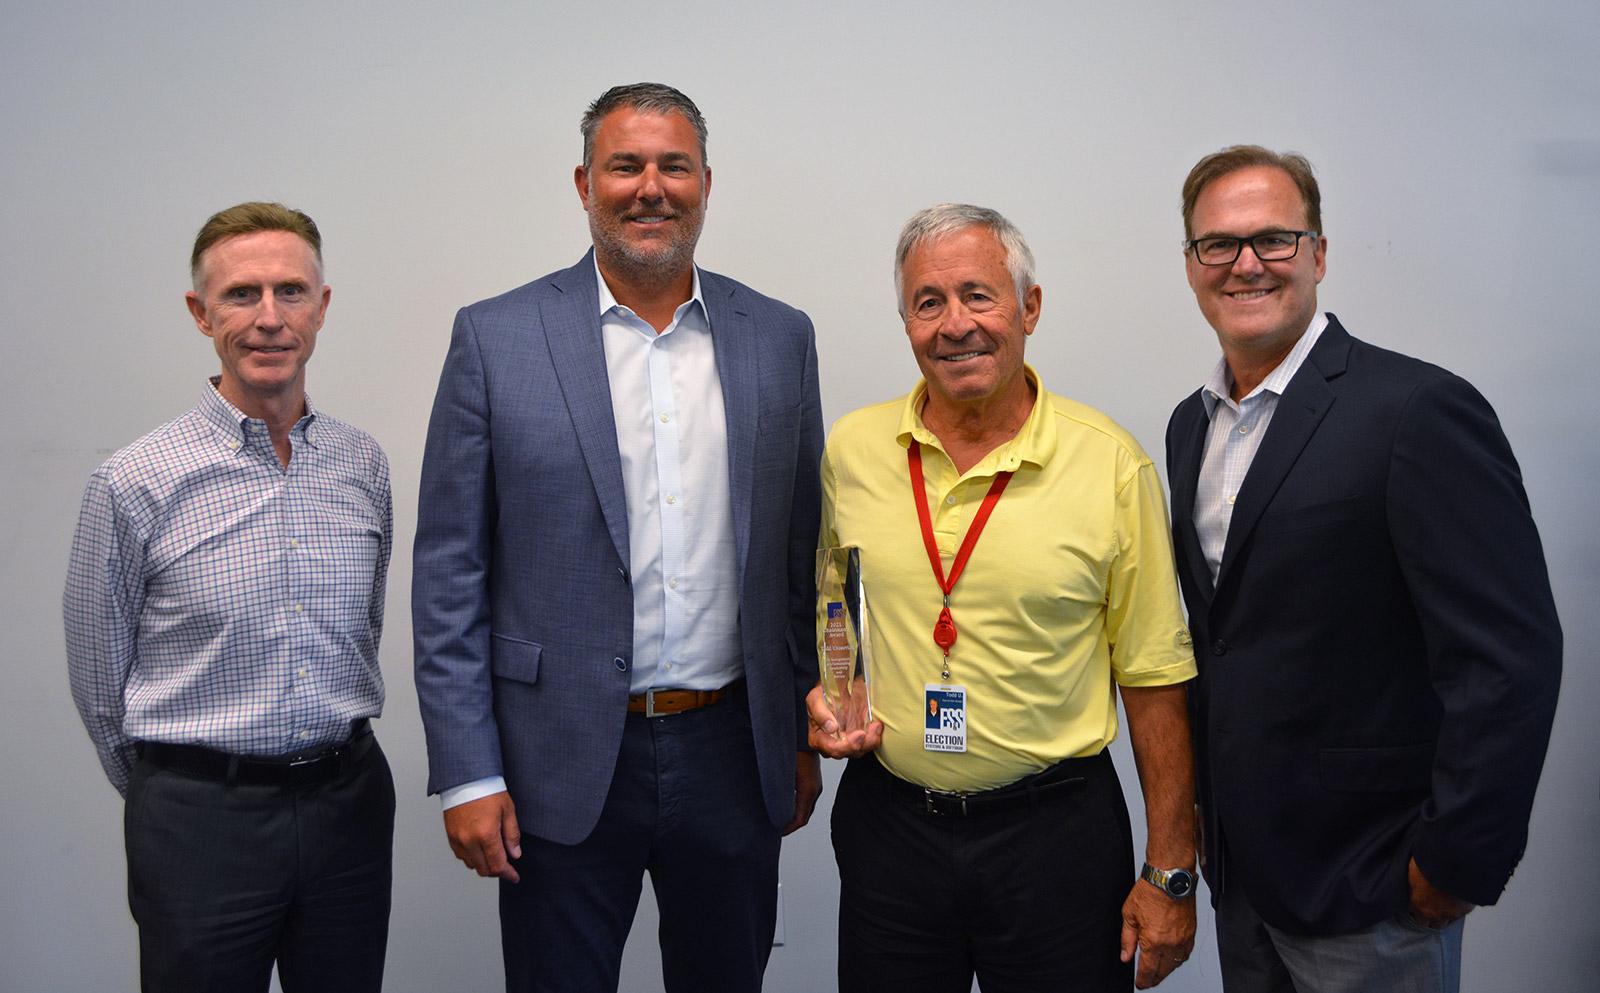 From left to right: Tom O'Brien, Tom Burt, 2021 Chairman's Award Winner Todd Urosevich, and Jim Schmidt